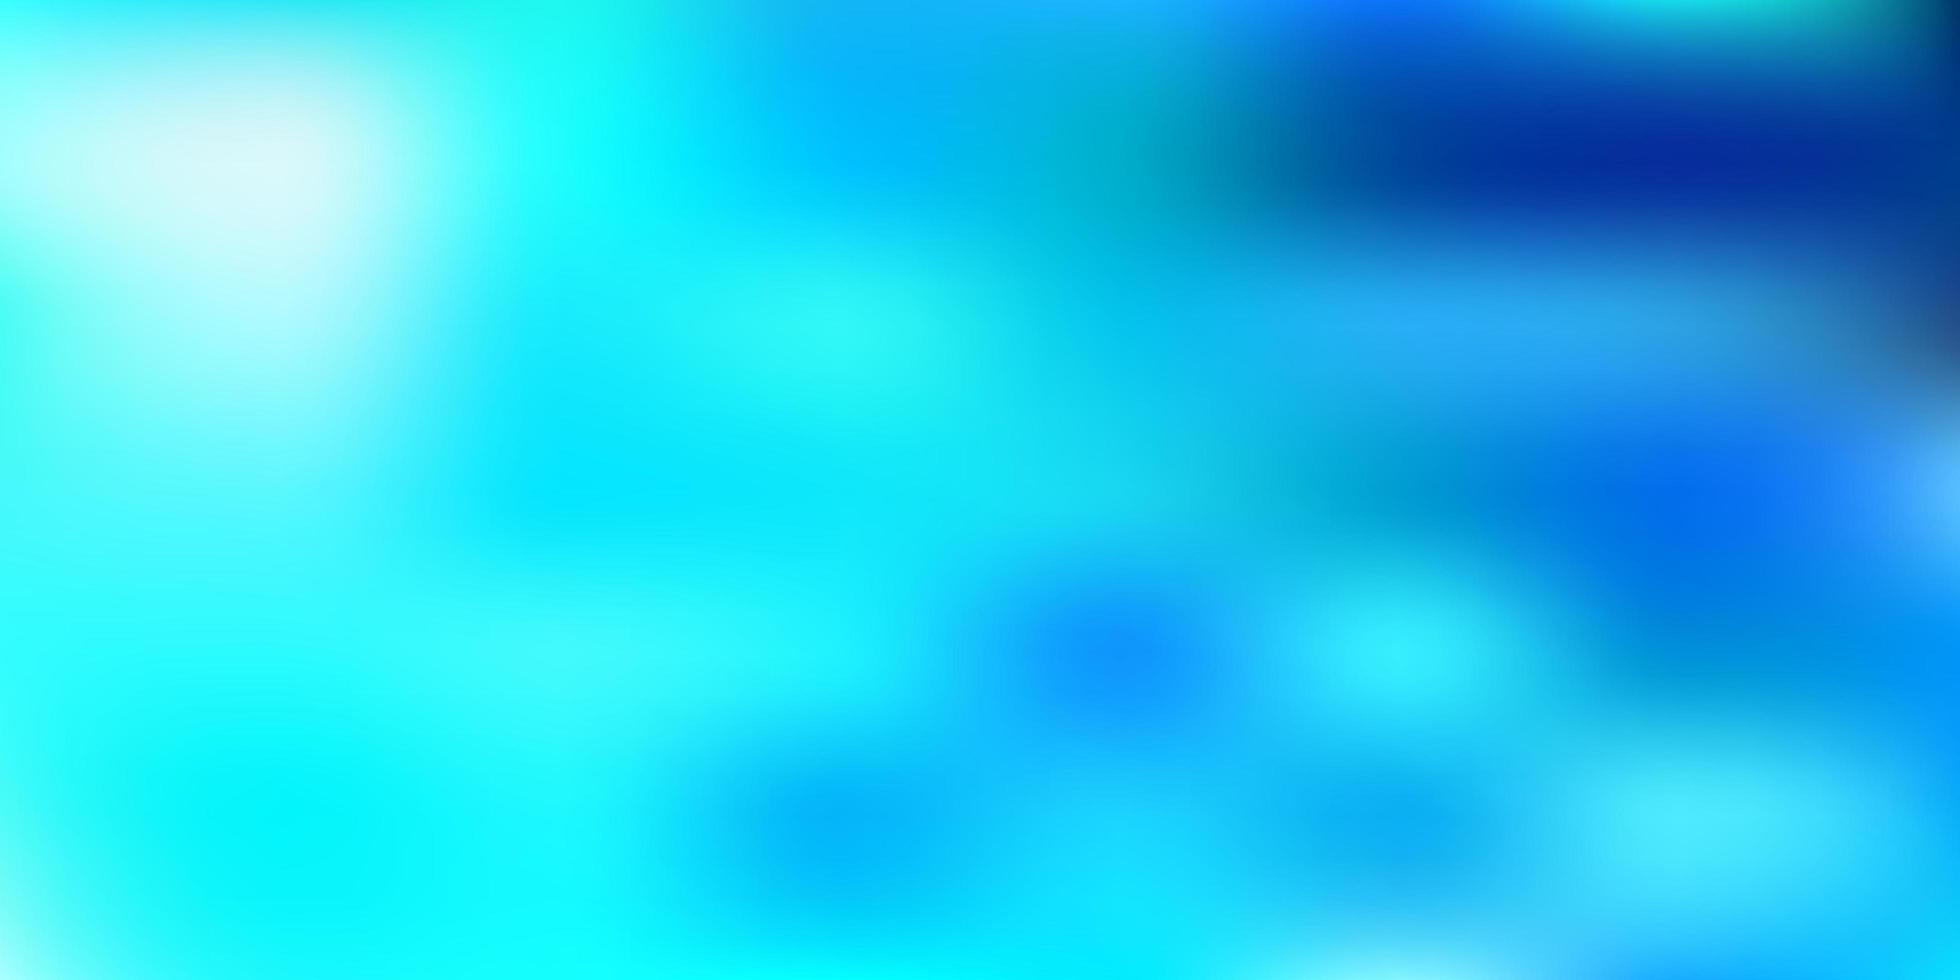 plantilla de desenfoque de vector azul claro